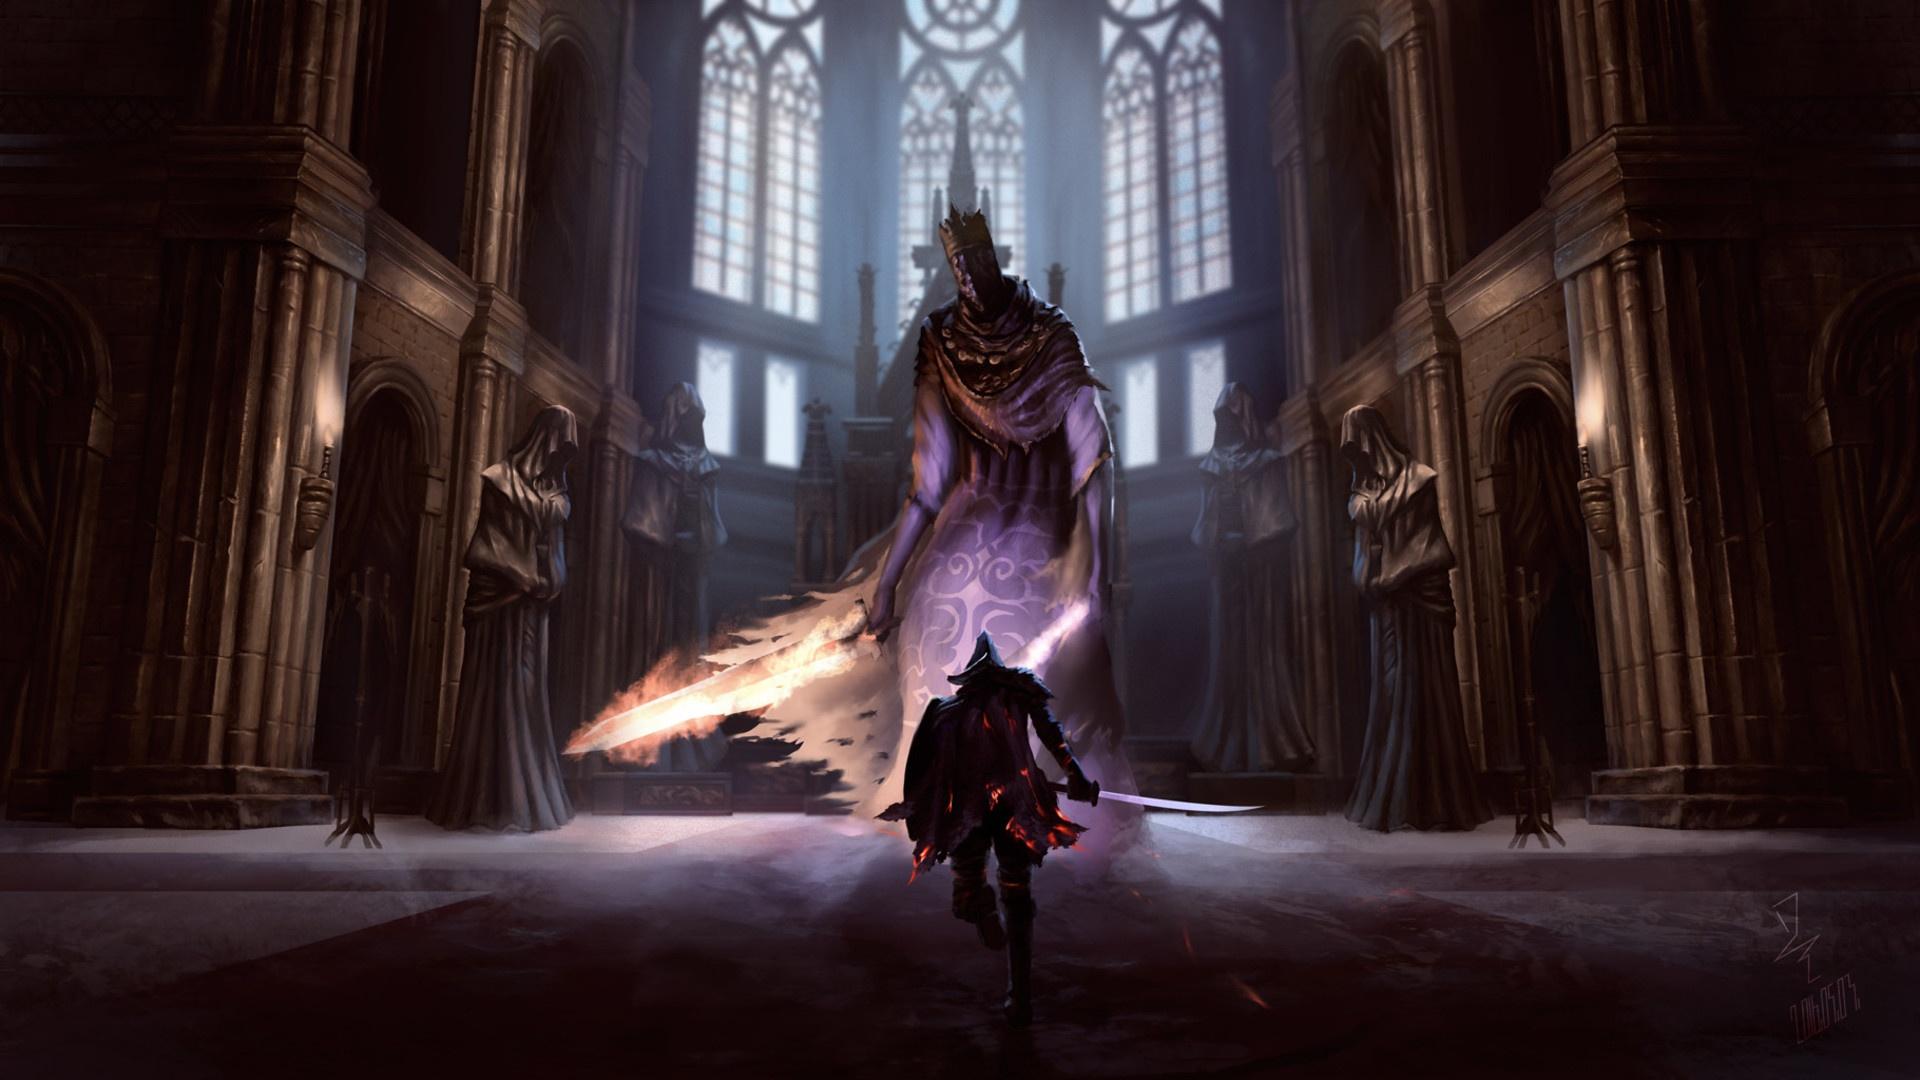 Dark Souls 3 background picture